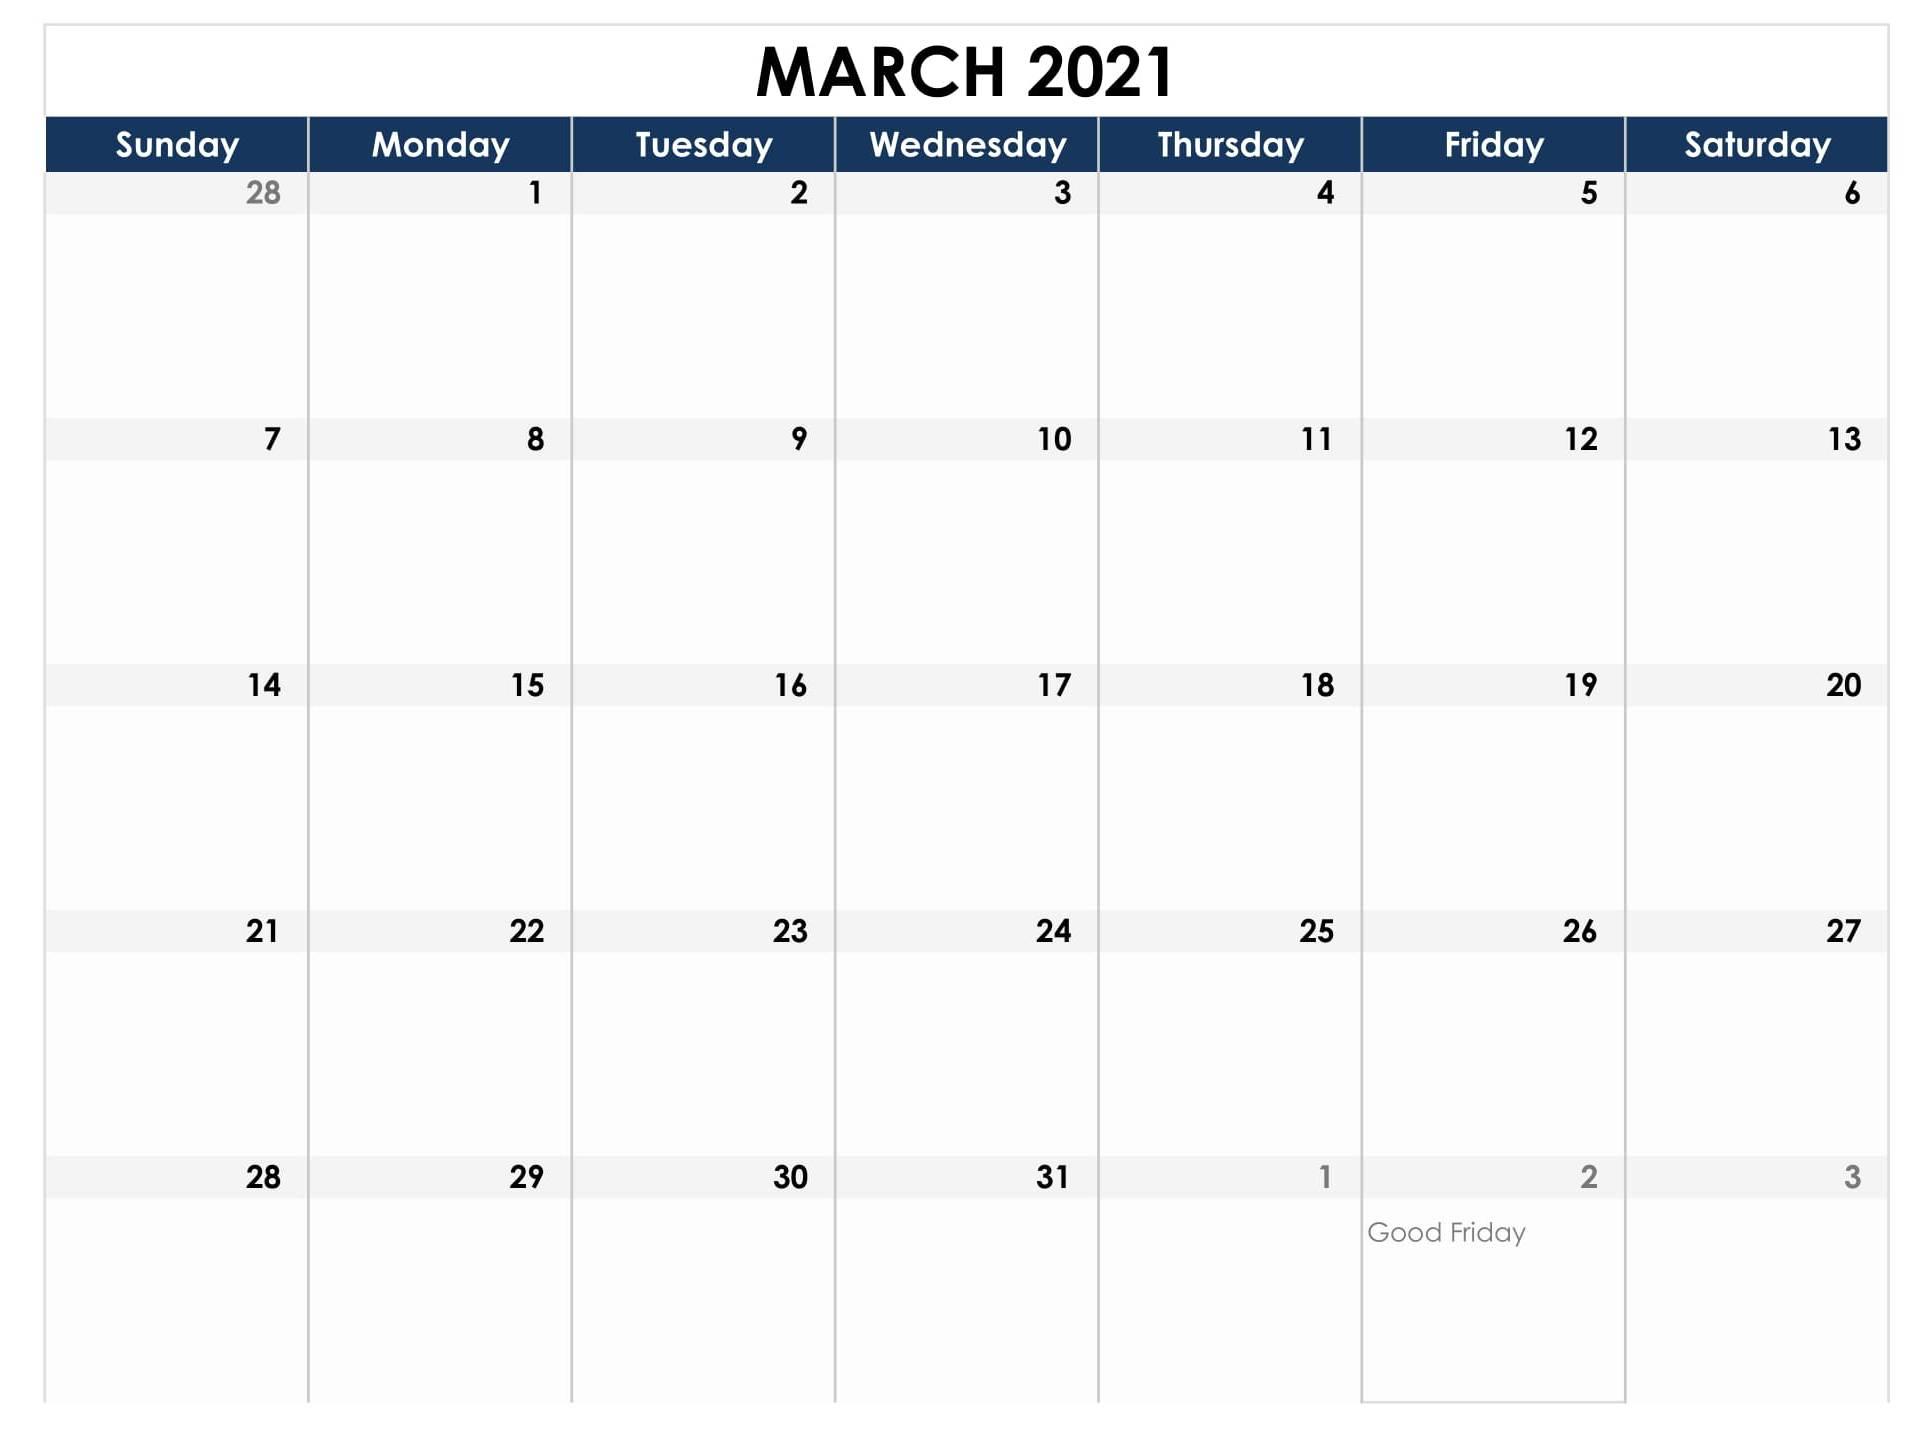 March 2021 Calendar Uk National Holidays Templates - One